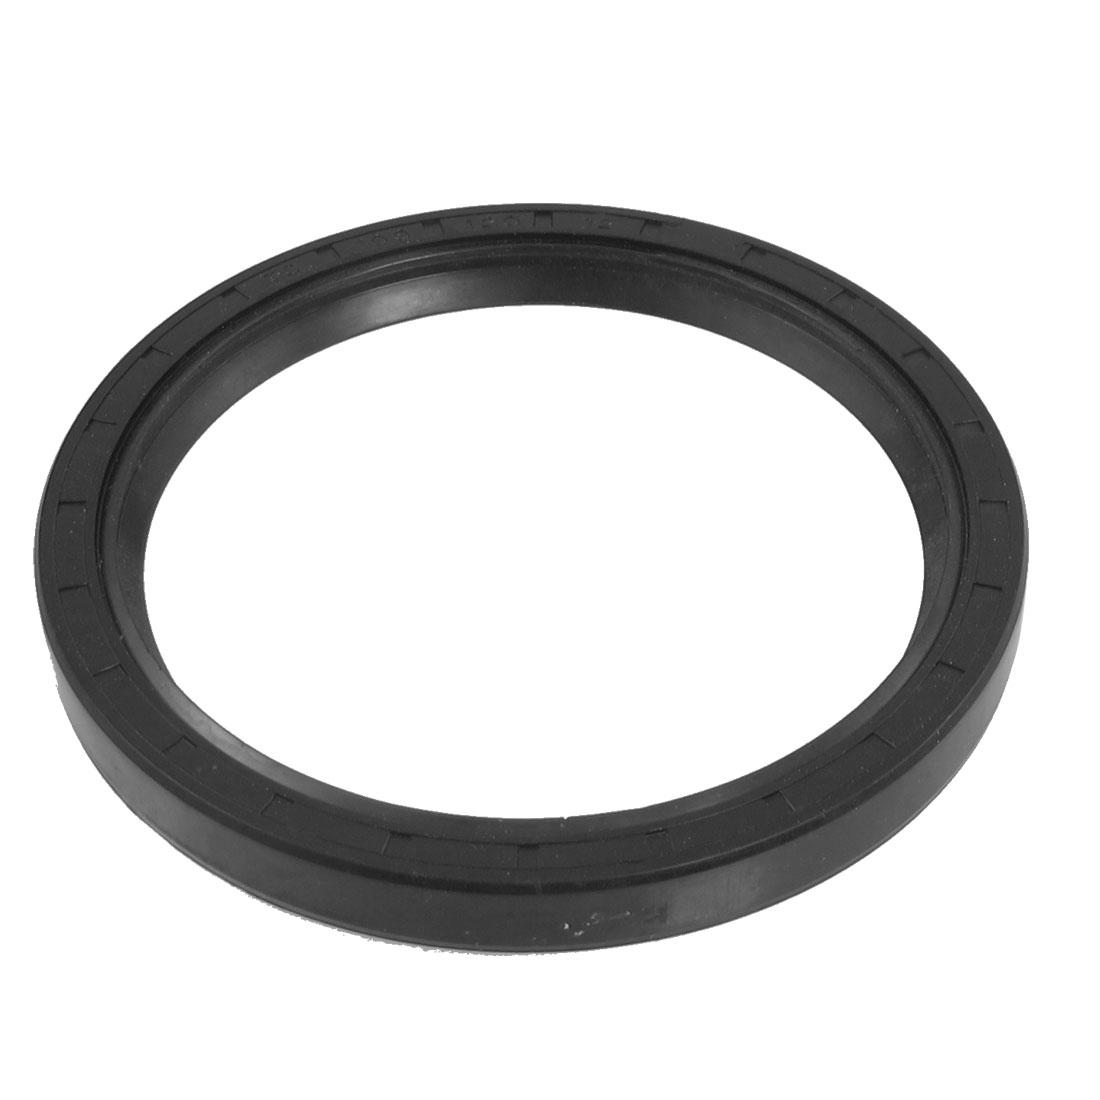 Black Nitrile Rubber Dual Lips Oil Shaft Seal TC 100mm x 120mm x 12mm